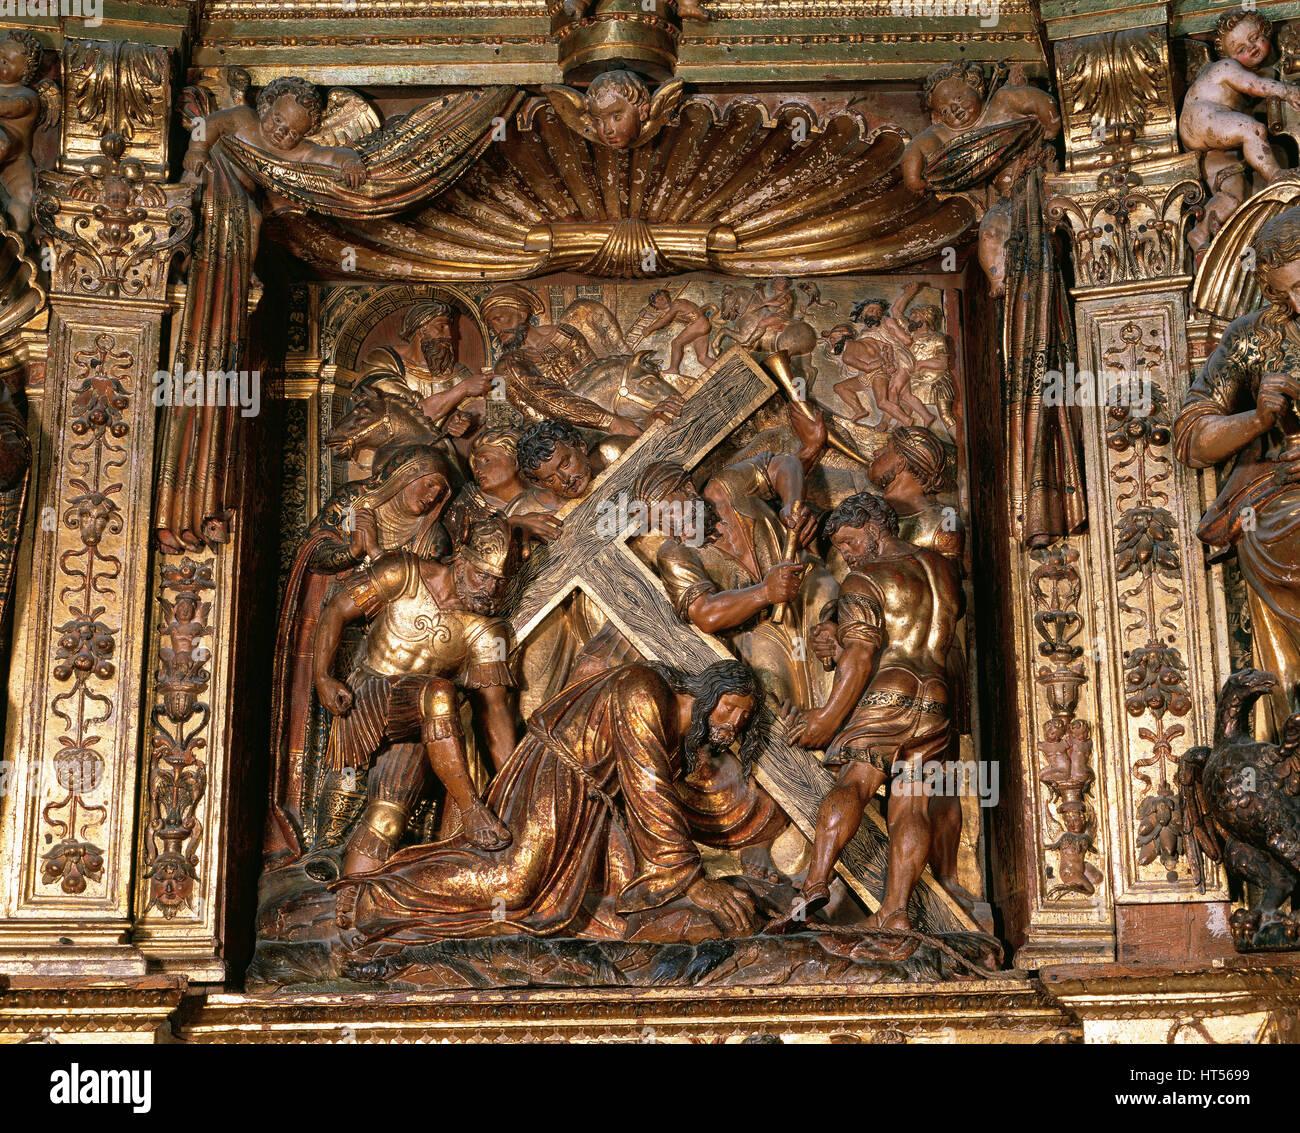 Damia Forment (1480-1540). Spanish sculptor. Cathedral of Santo Domingo de la Calzada. Main Altarpiece, 1537-40. - Stock Image